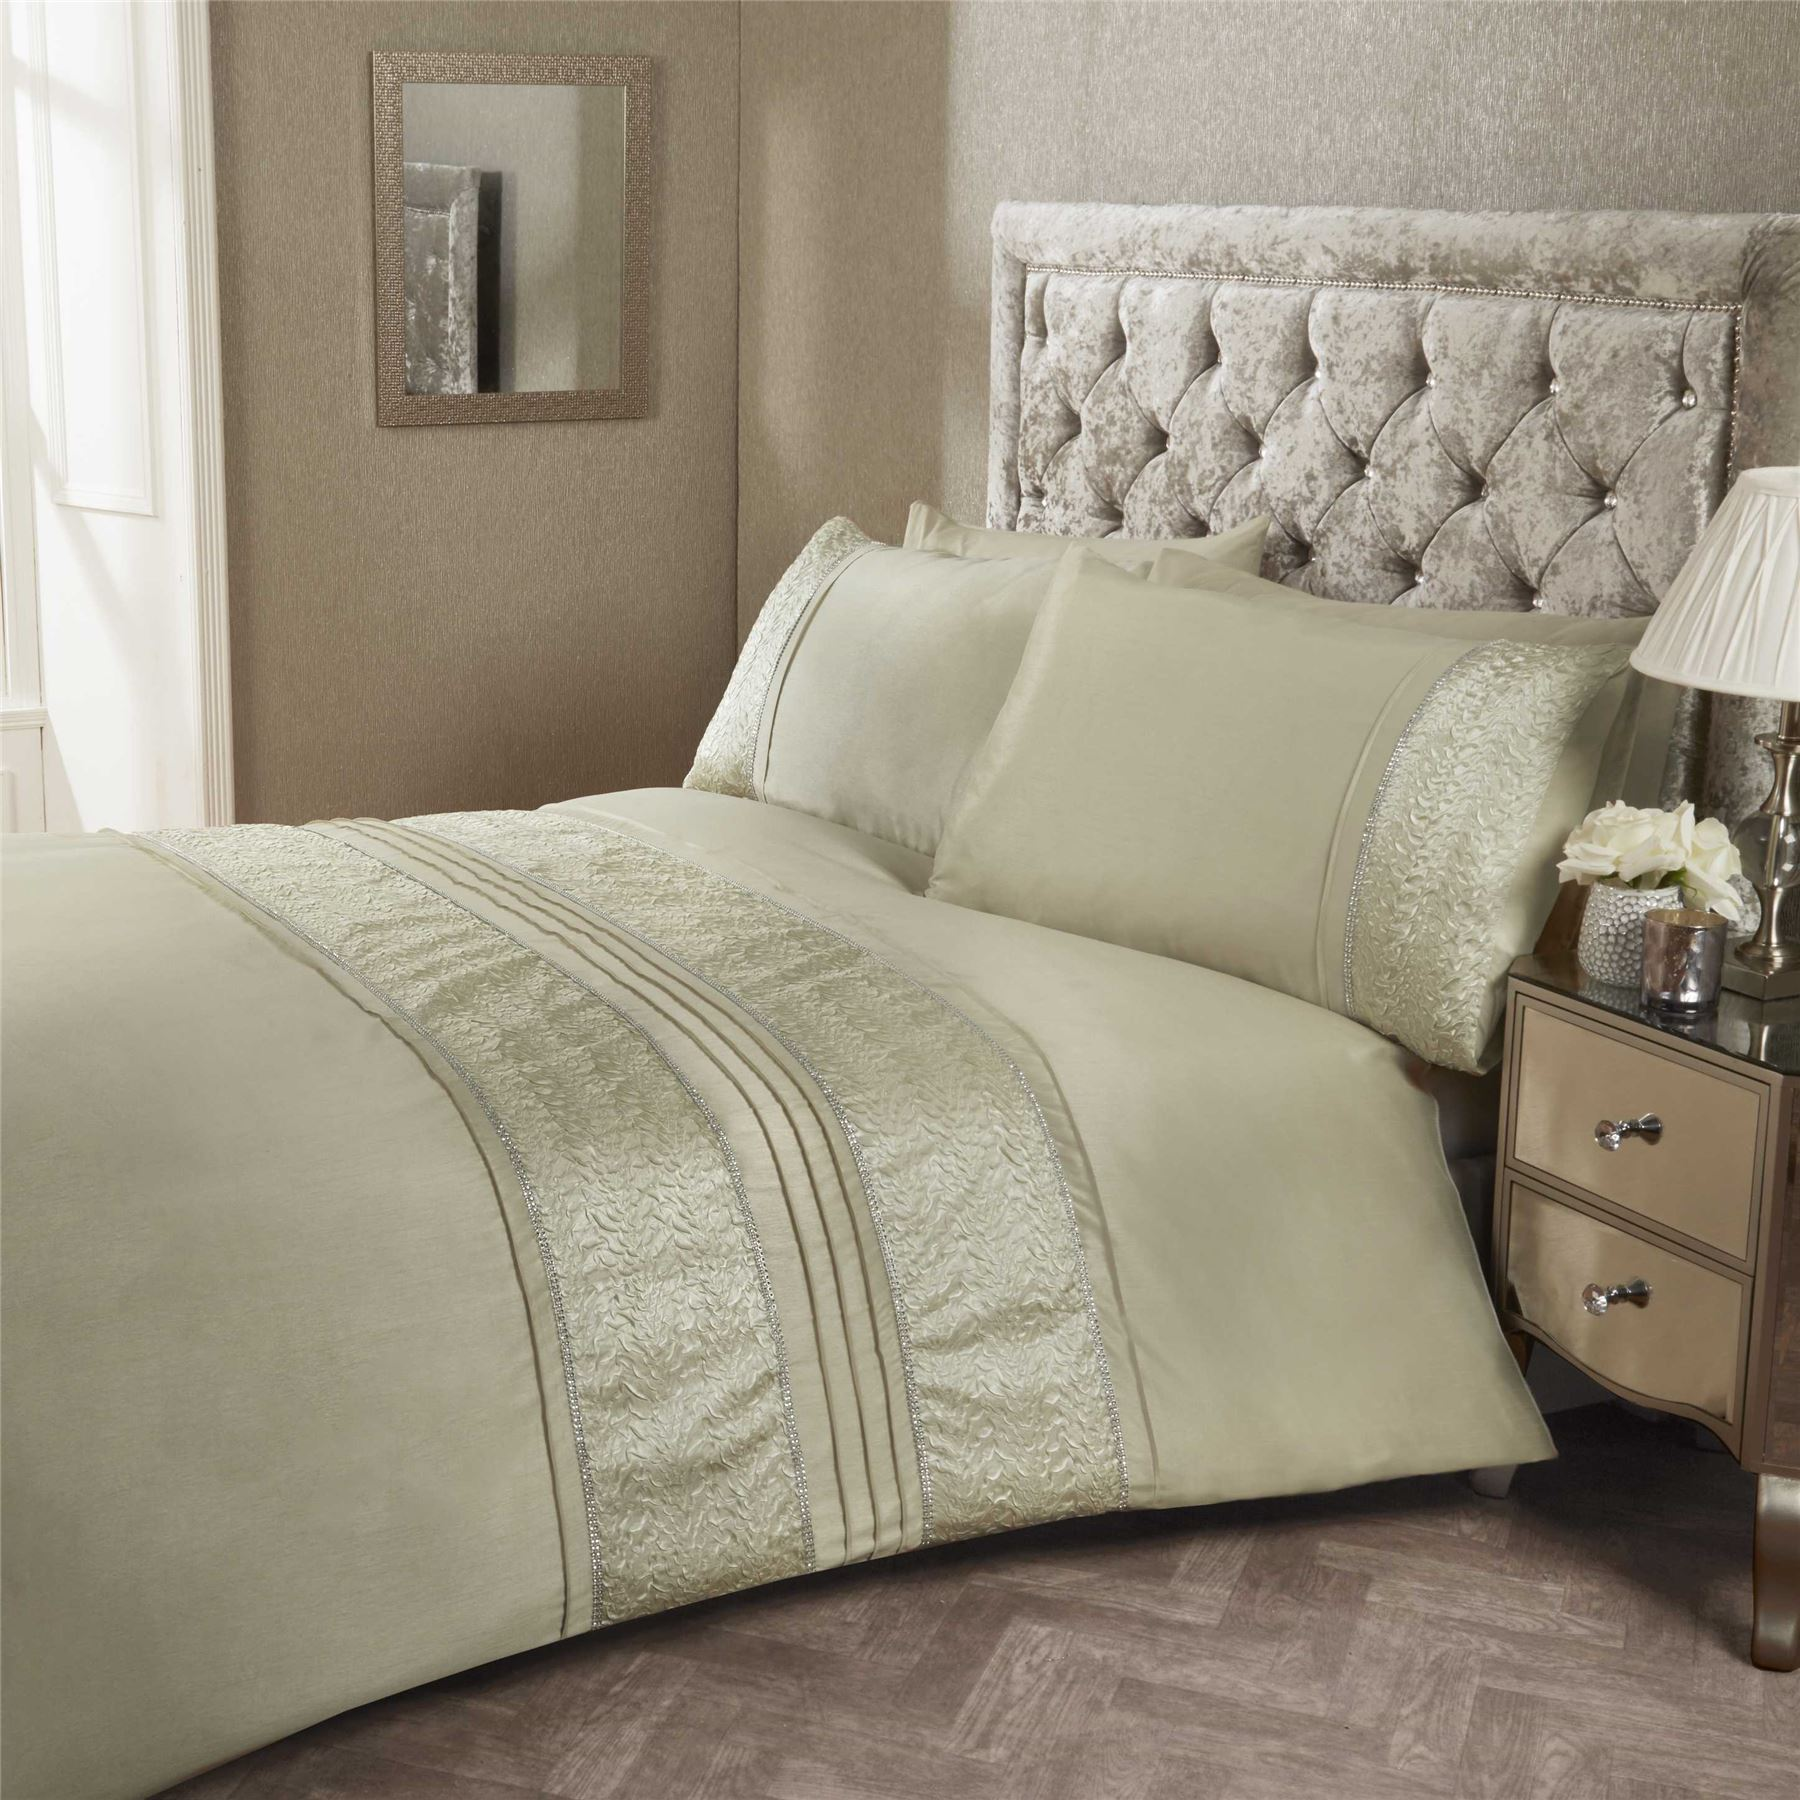 Crystal Diamante Detail Duvet Quilt Cover Bed Sets White